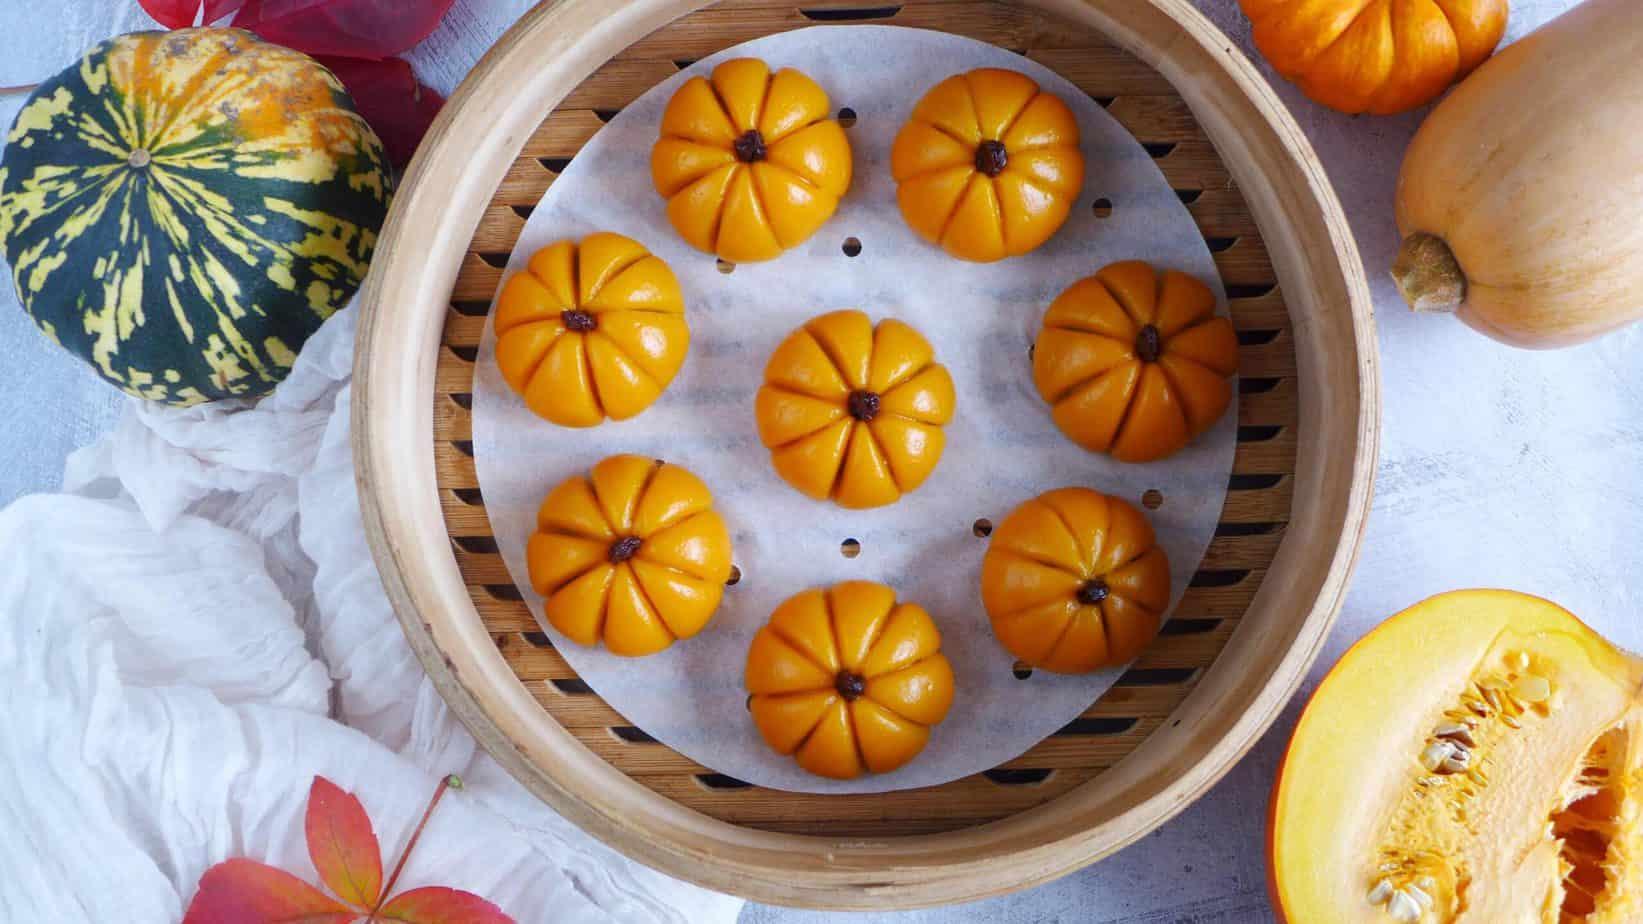 Eight pumpkin cakes in a steamer